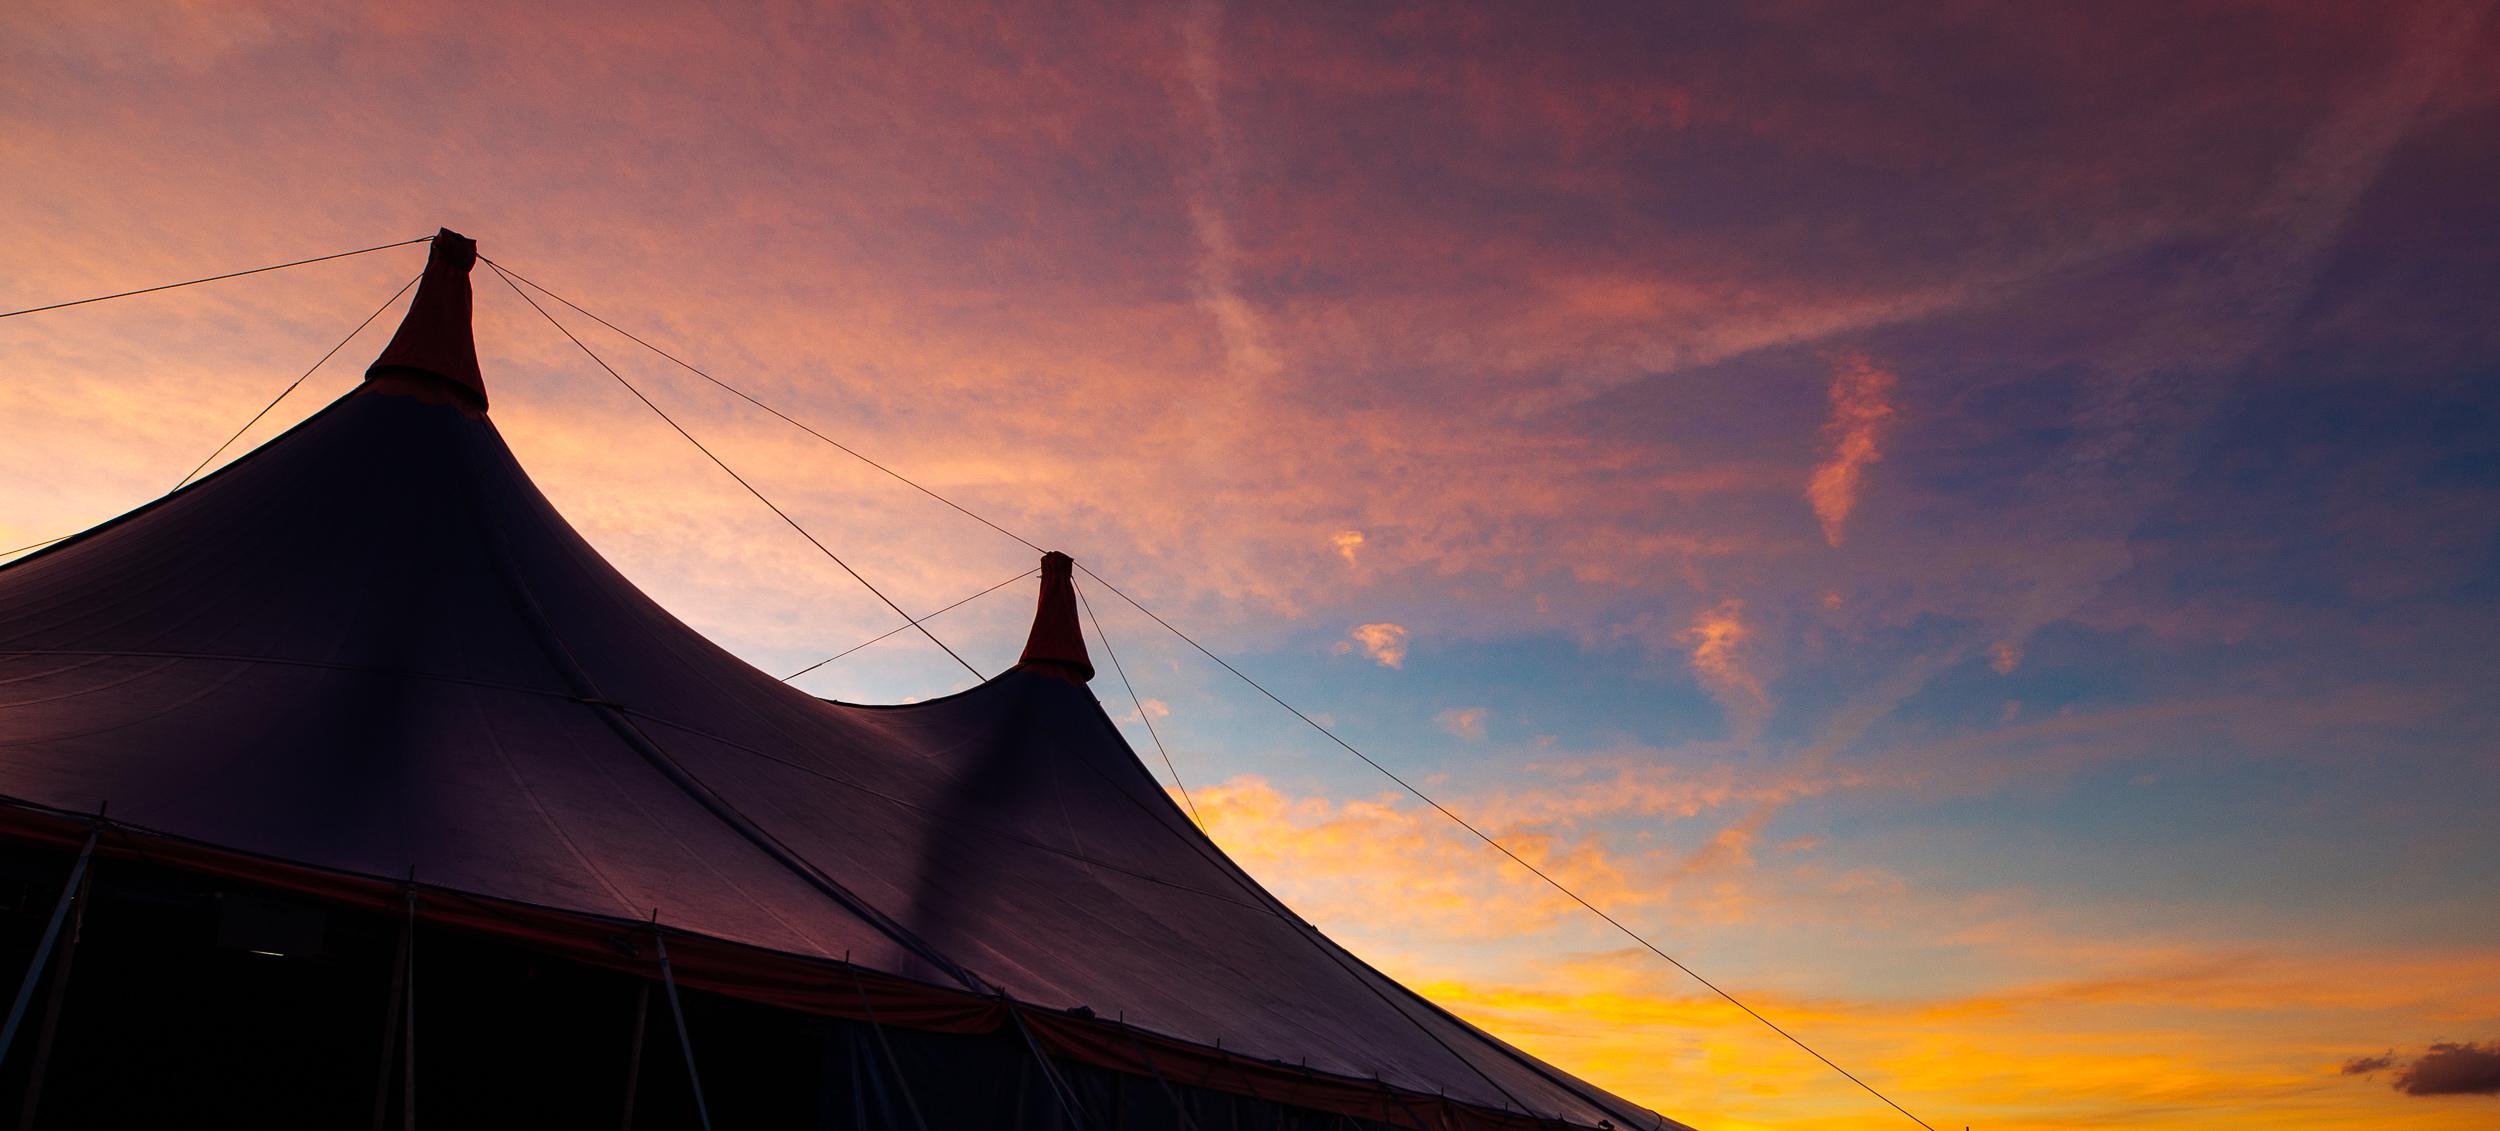 Sunset at Leeds Festival